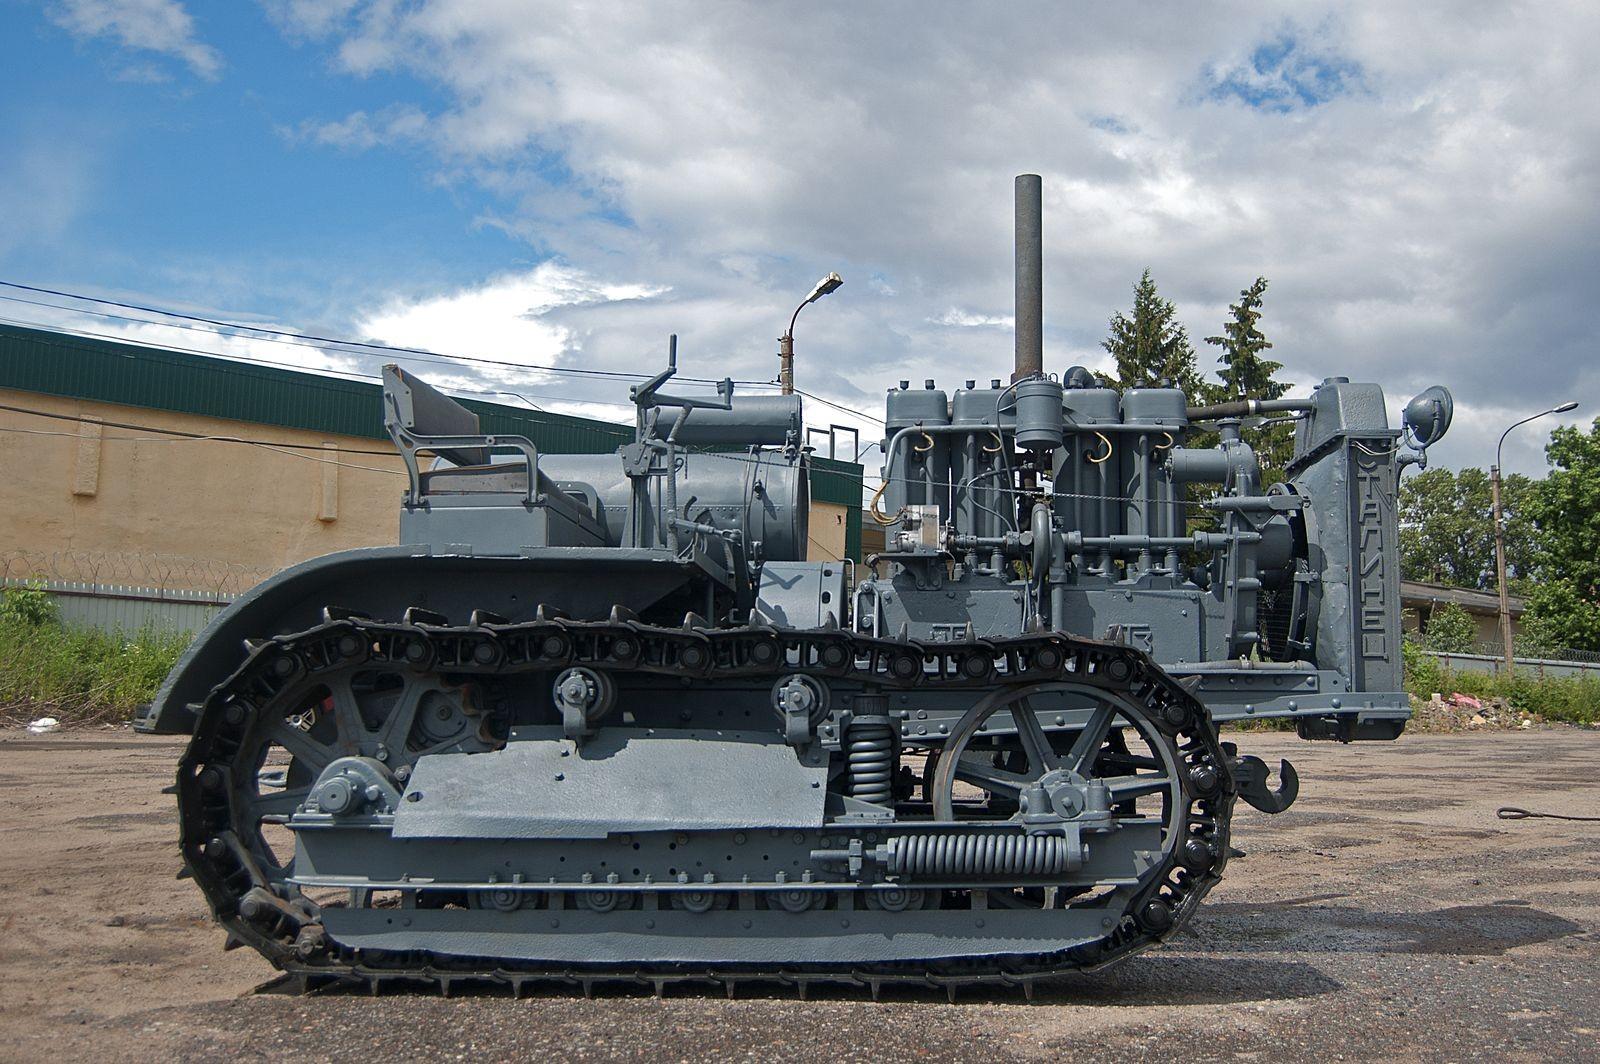 10,5 тонн железа и 60 «лошадок»: тест-драйв трактора С-60 «Сталинец»